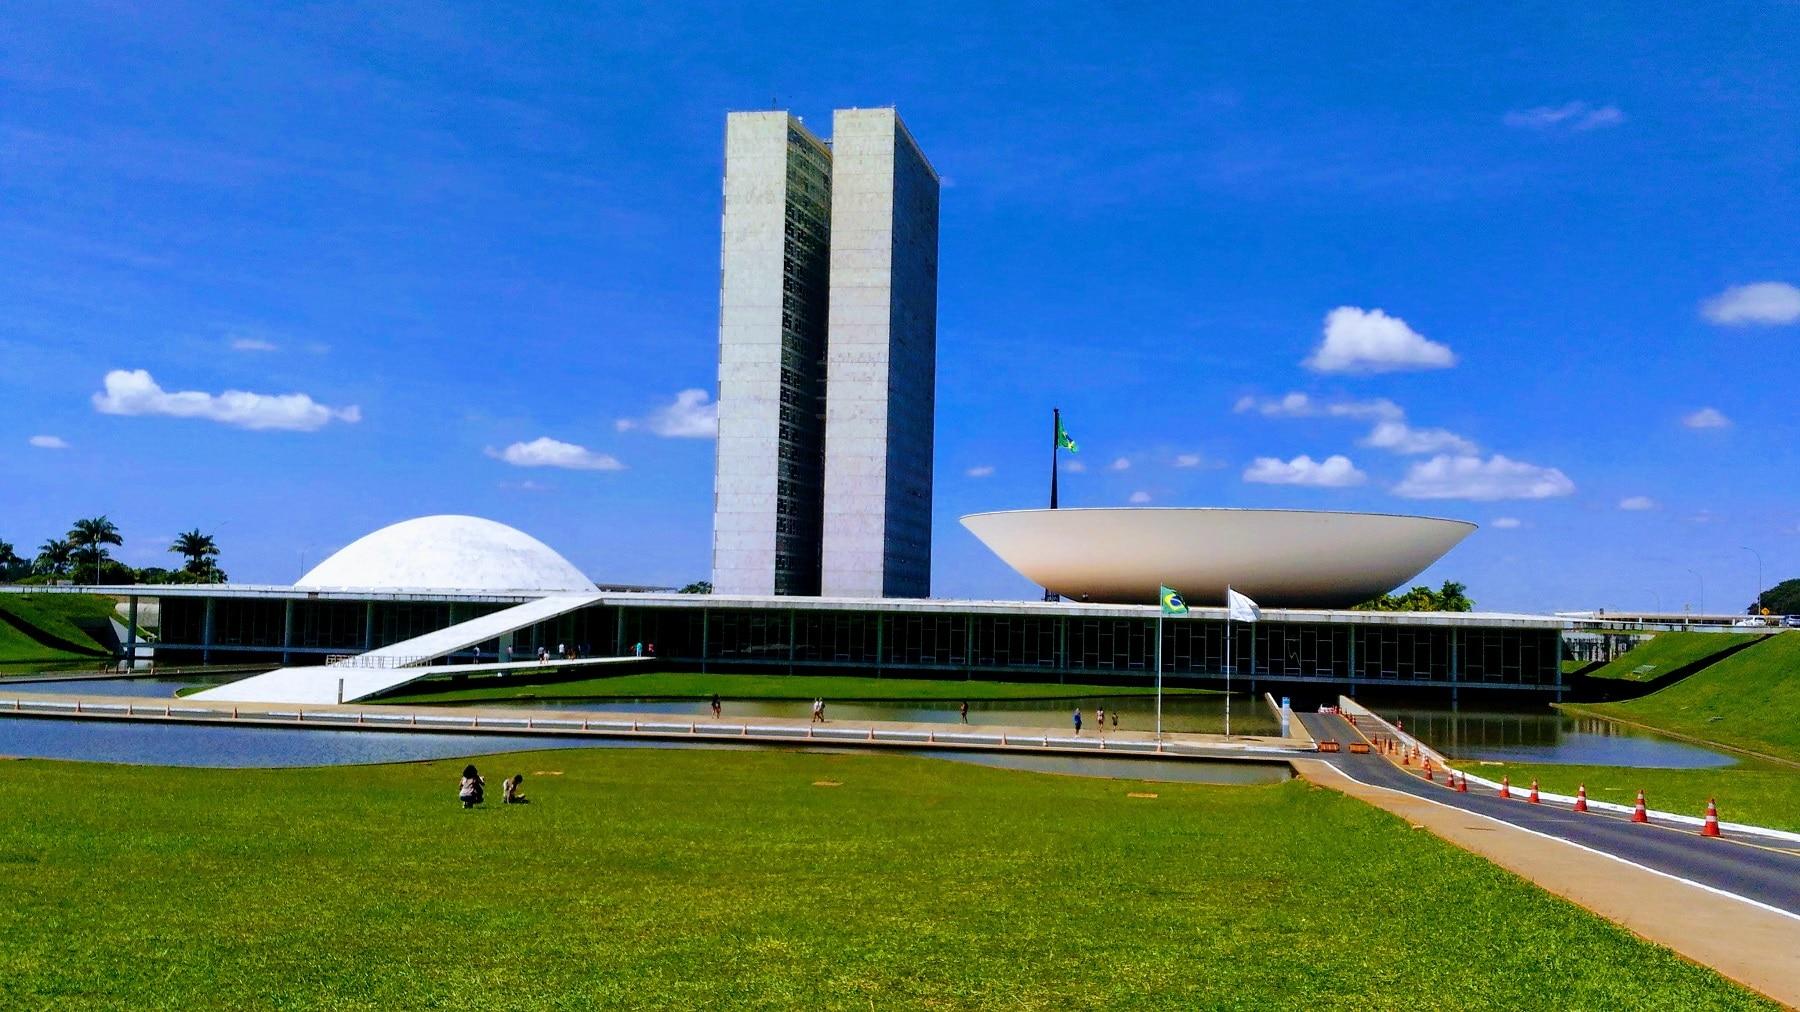 Inauguração CECVP Brasília